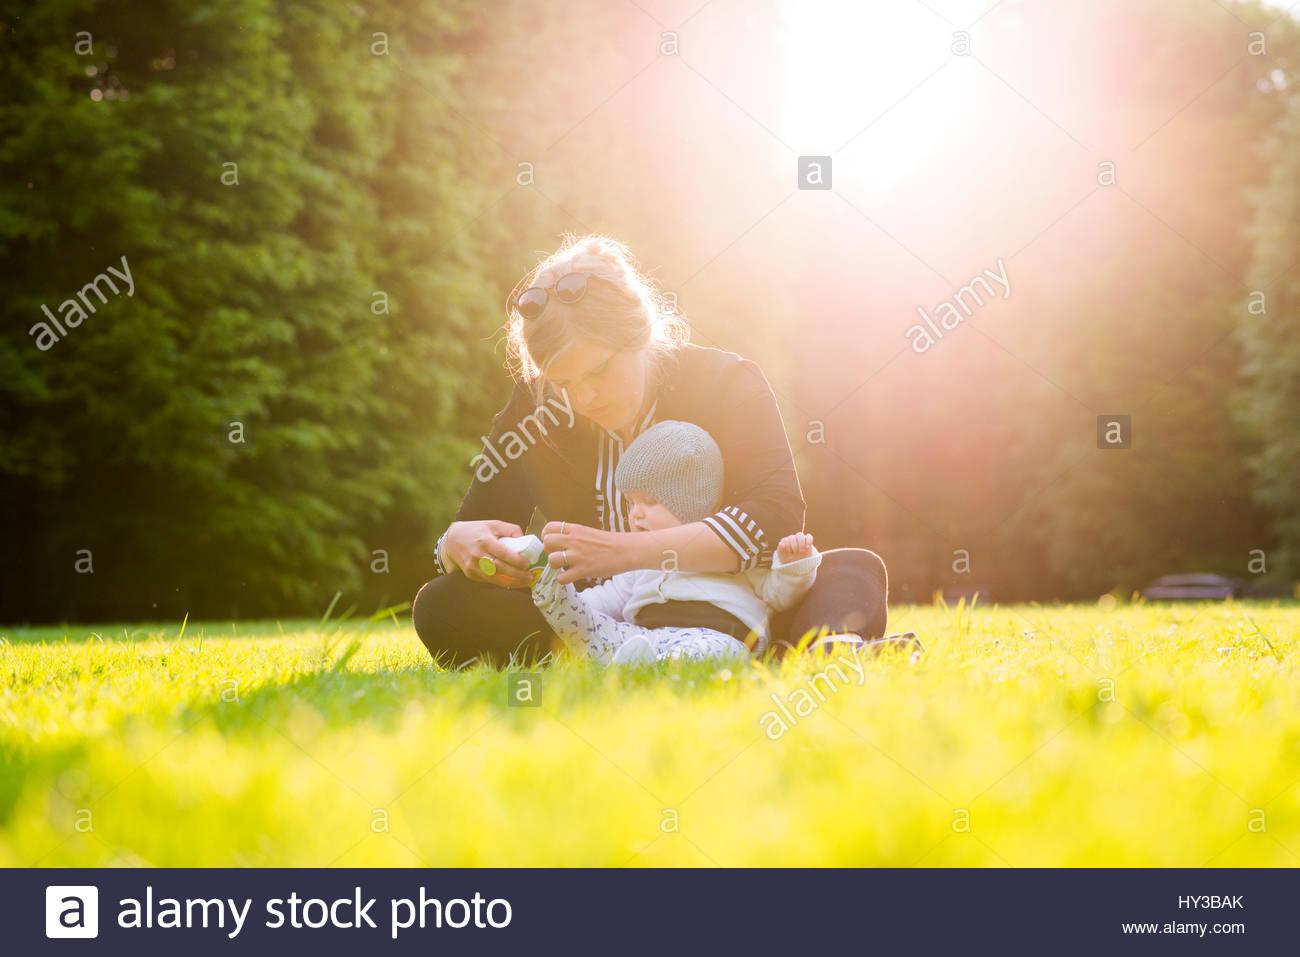 Sweden, Skane, Malmo, Mother dressing son (18-23 months) in park - Stock Image